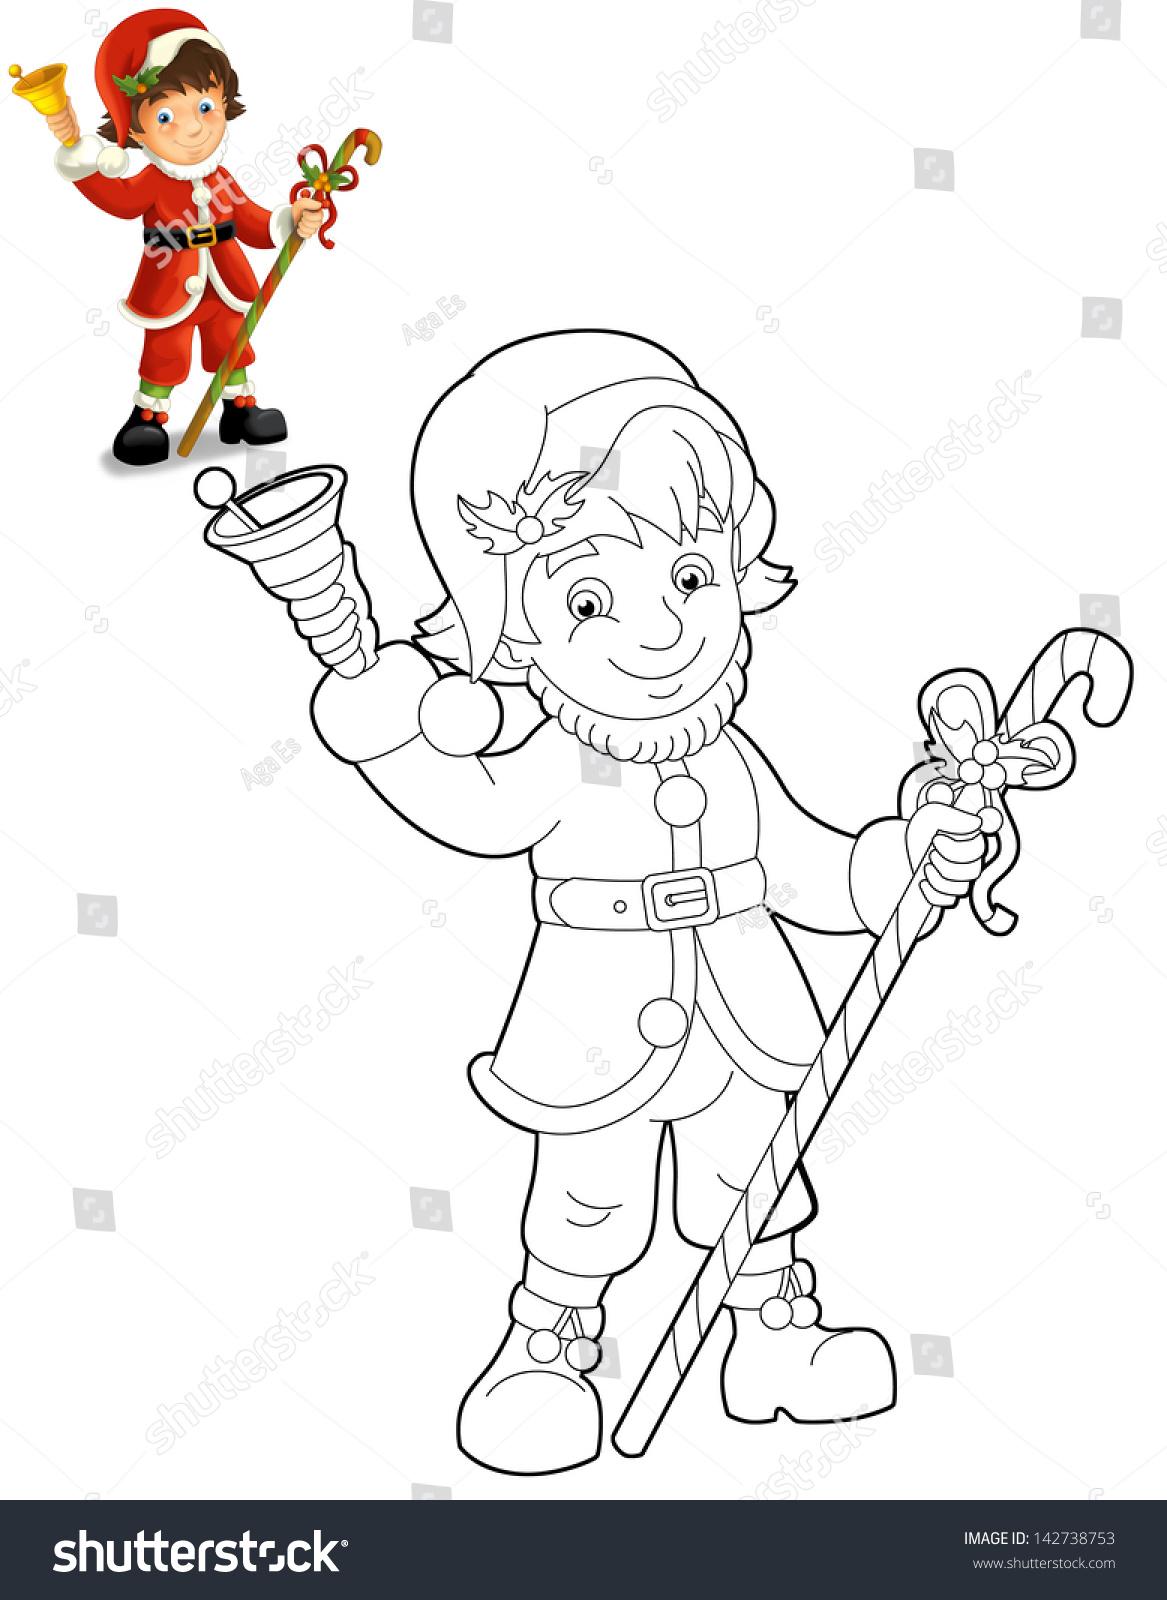 Coloring Page Santa Claus Illustration Stock Illustration 142738753